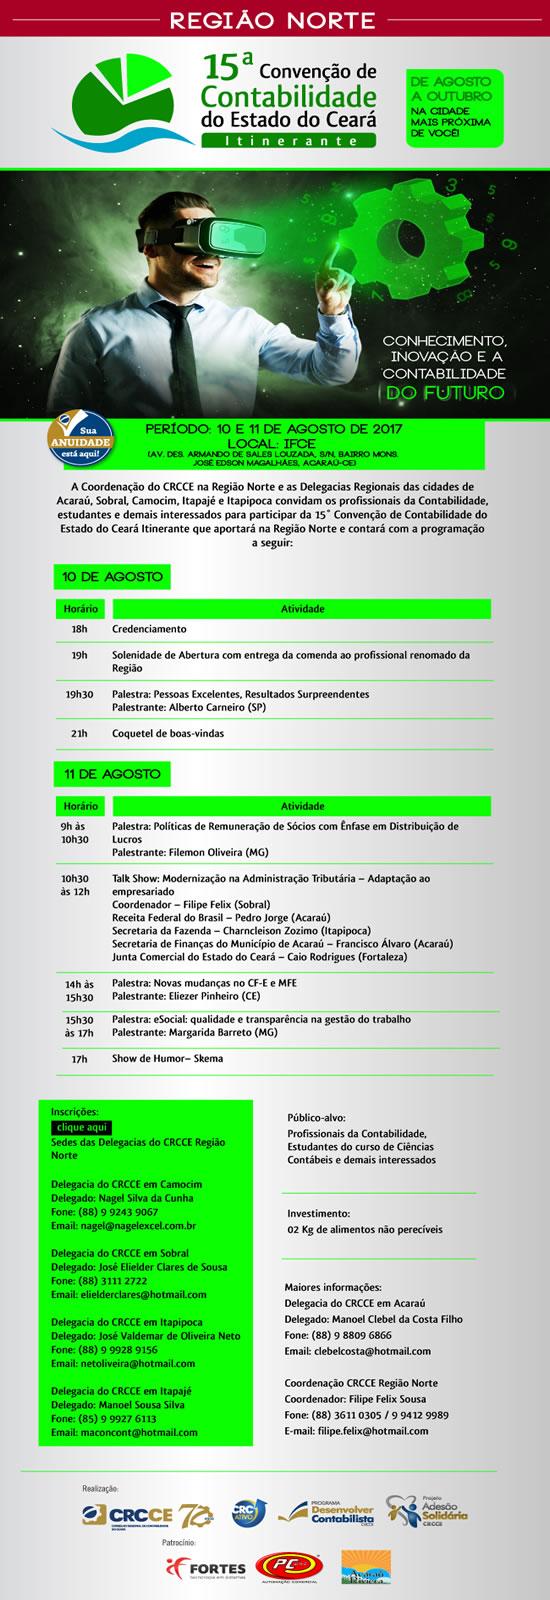 al4-emkt-15convencao-RegiaoNorte-jul17 (3)